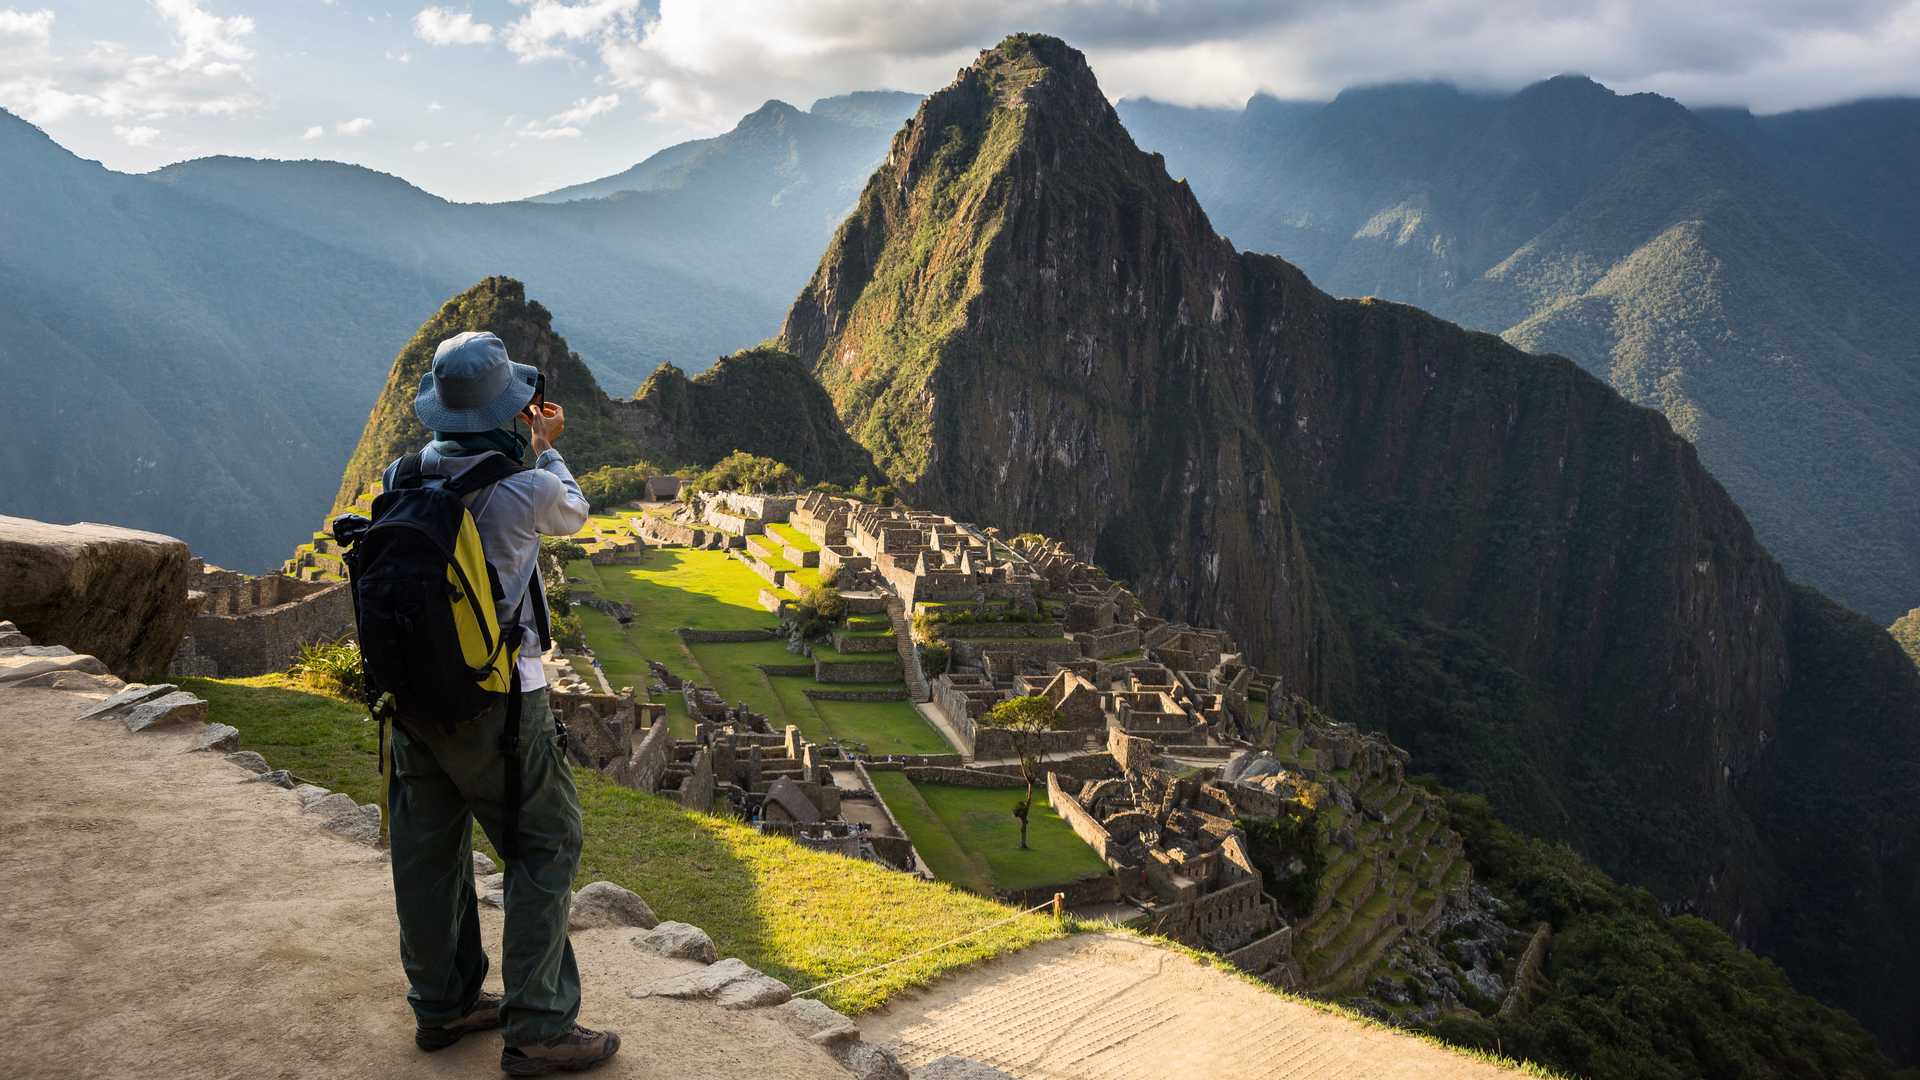 Traveler photographs Machu Picchu after Inca Jungle Trail